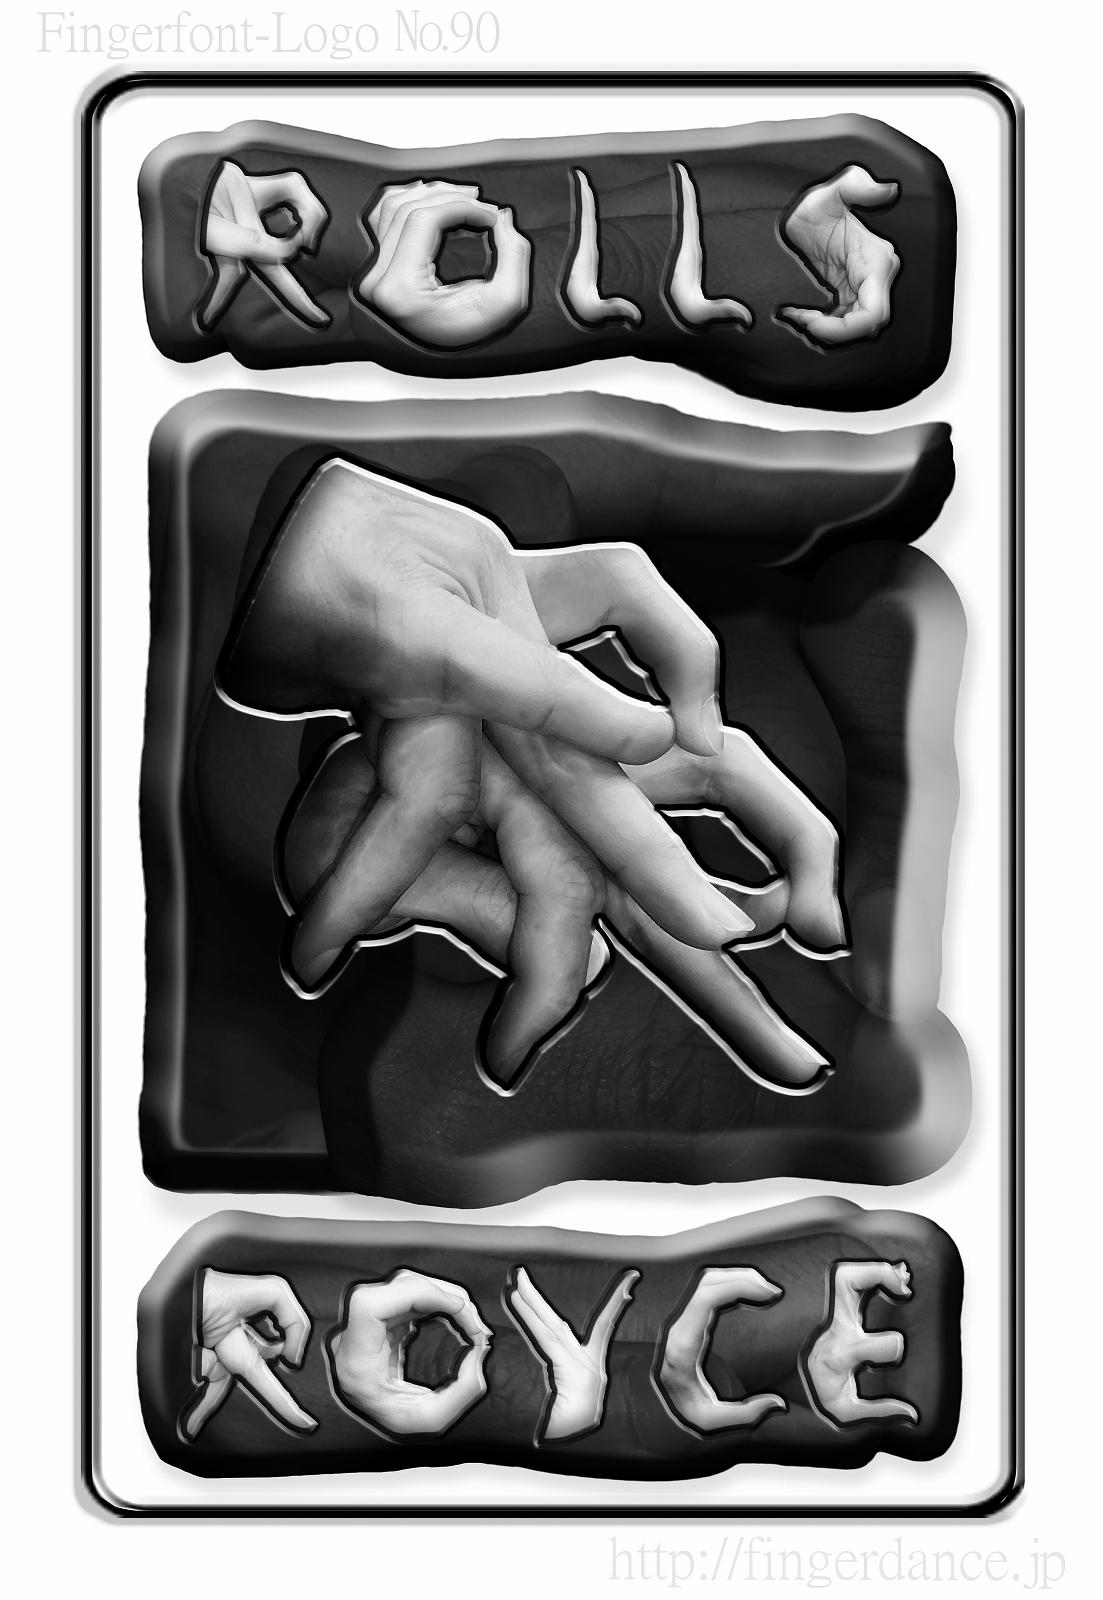 RollsRoyce-fingerhttp://fingerdance.jp/L/logohand ロールスロイス・フィンガーロゴハンド手指